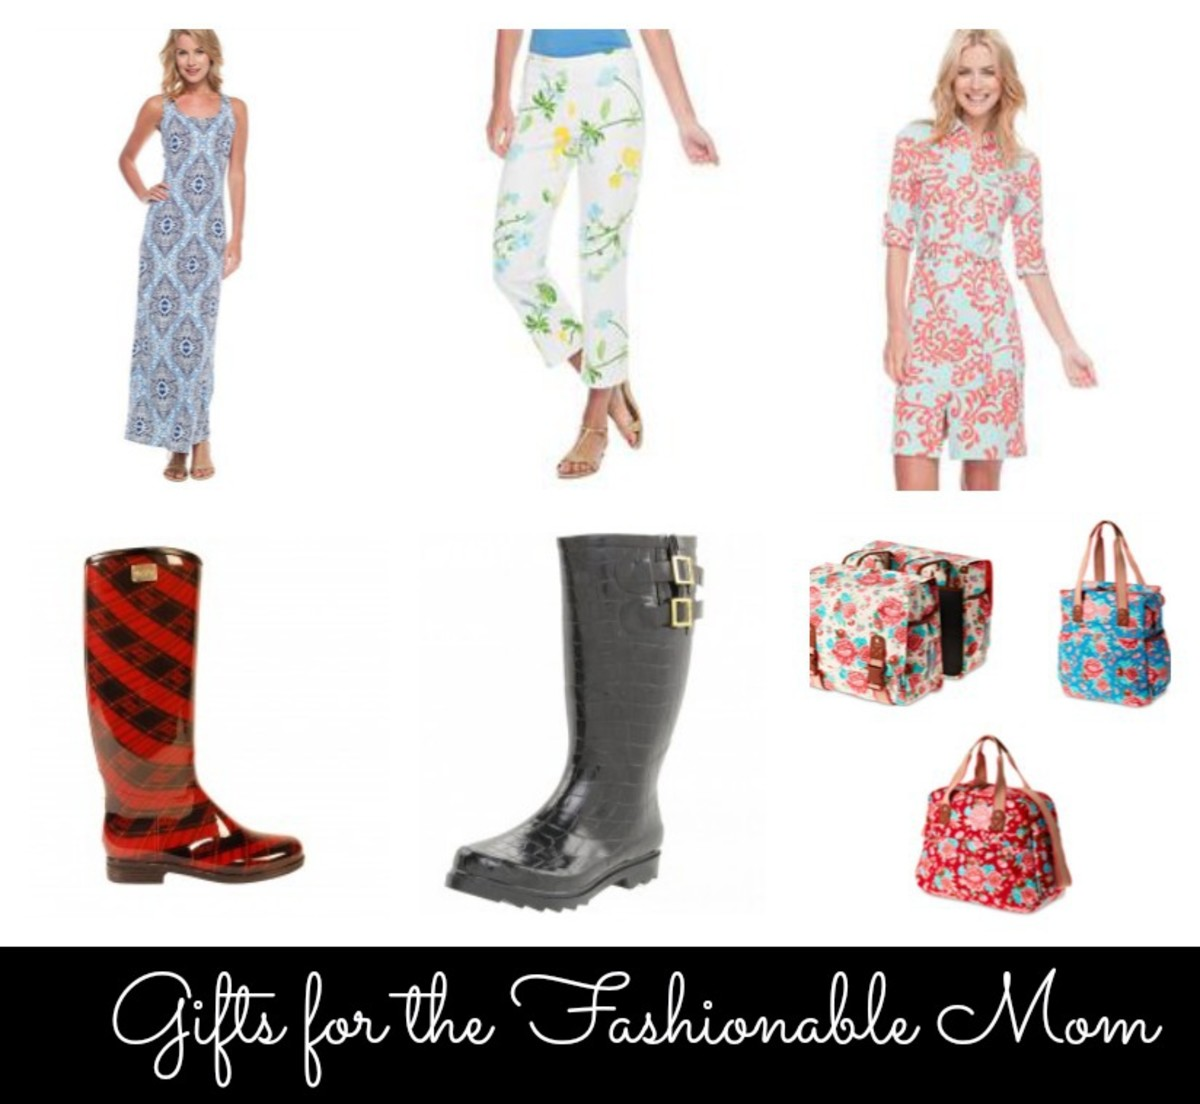 fashionmom